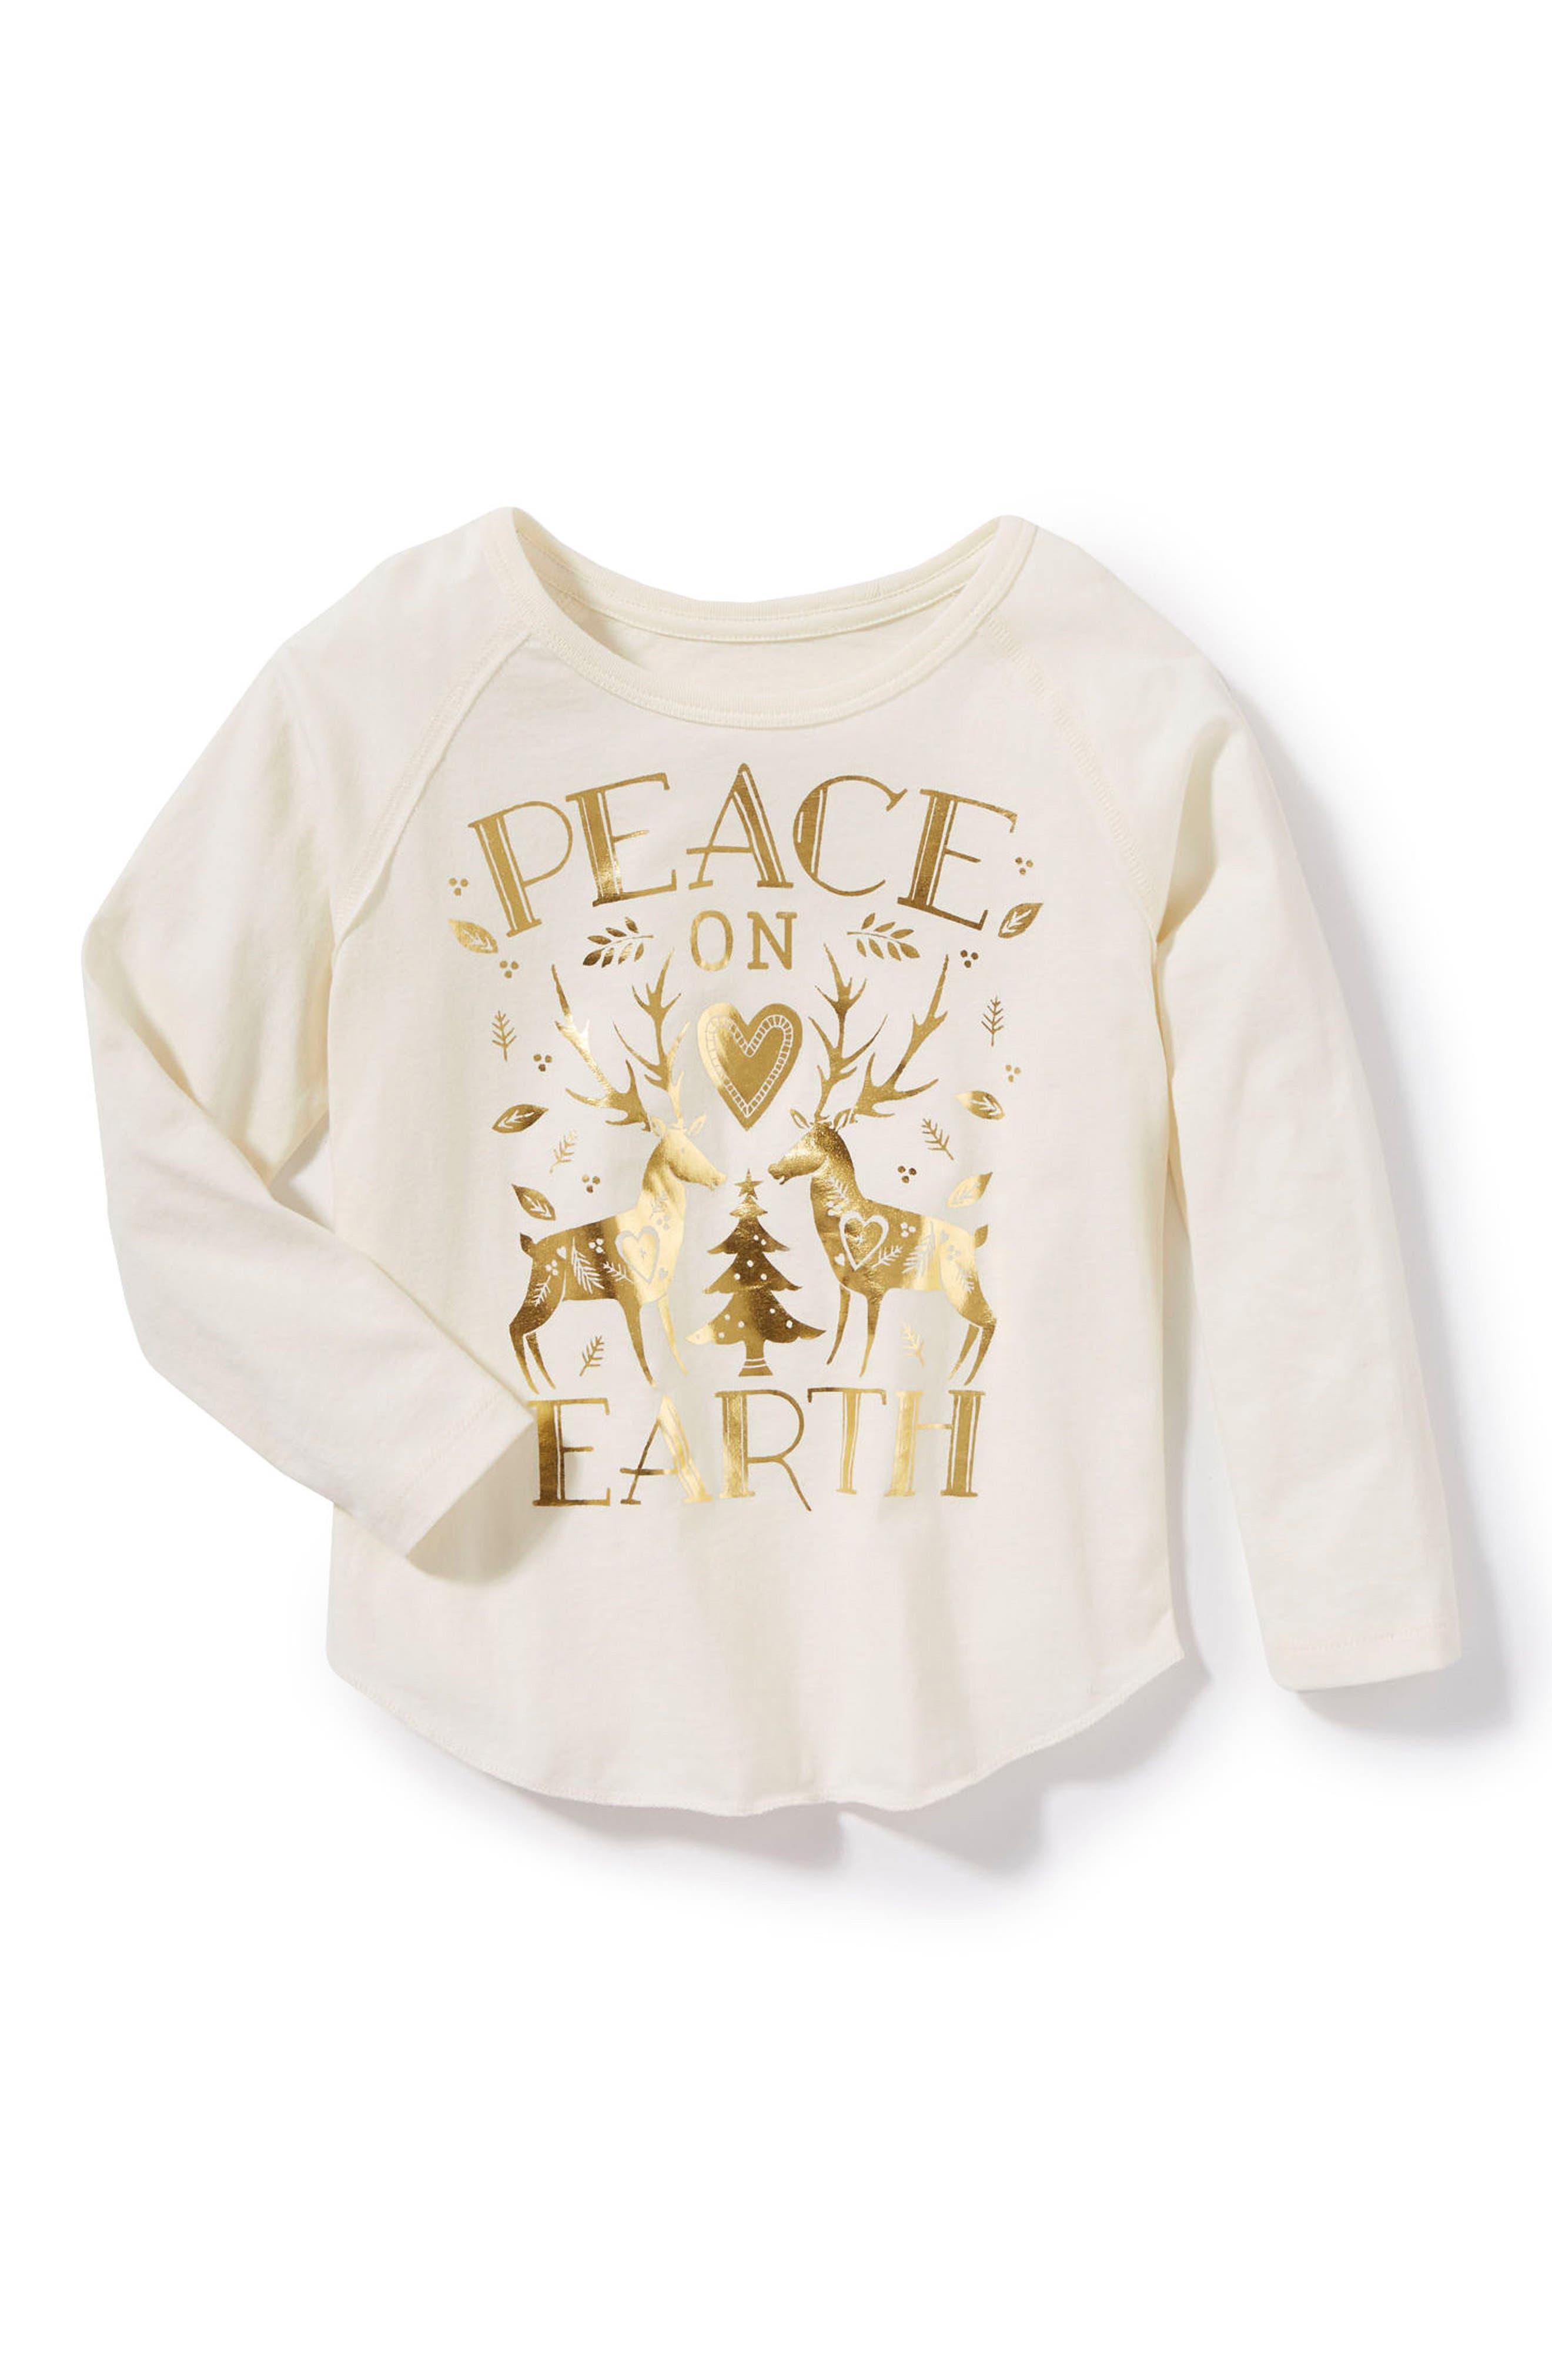 Alternate Image 1 Selected - Peek Peace on Earth Foil Print Tee (Toddler Girls, Little Girls & Big Girls)